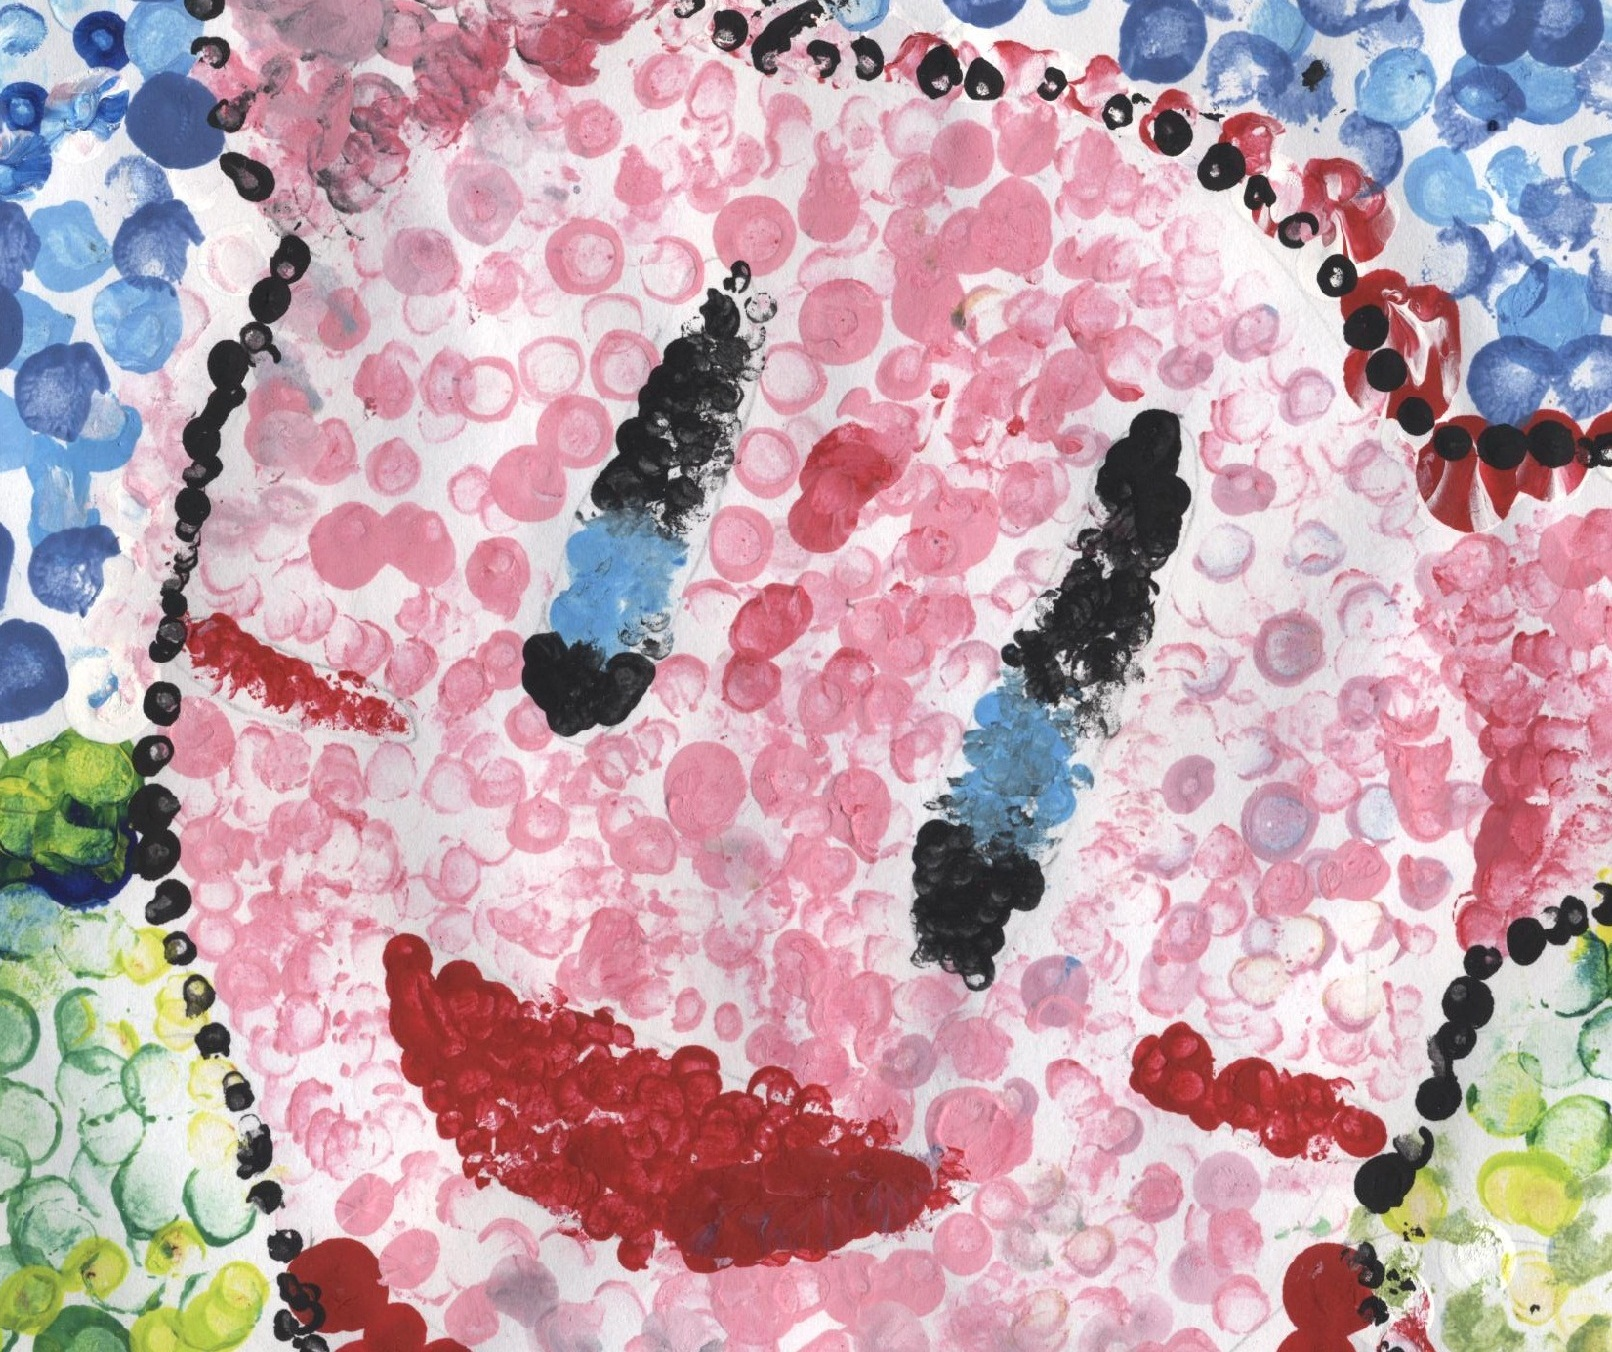 Kirby-san of the stars